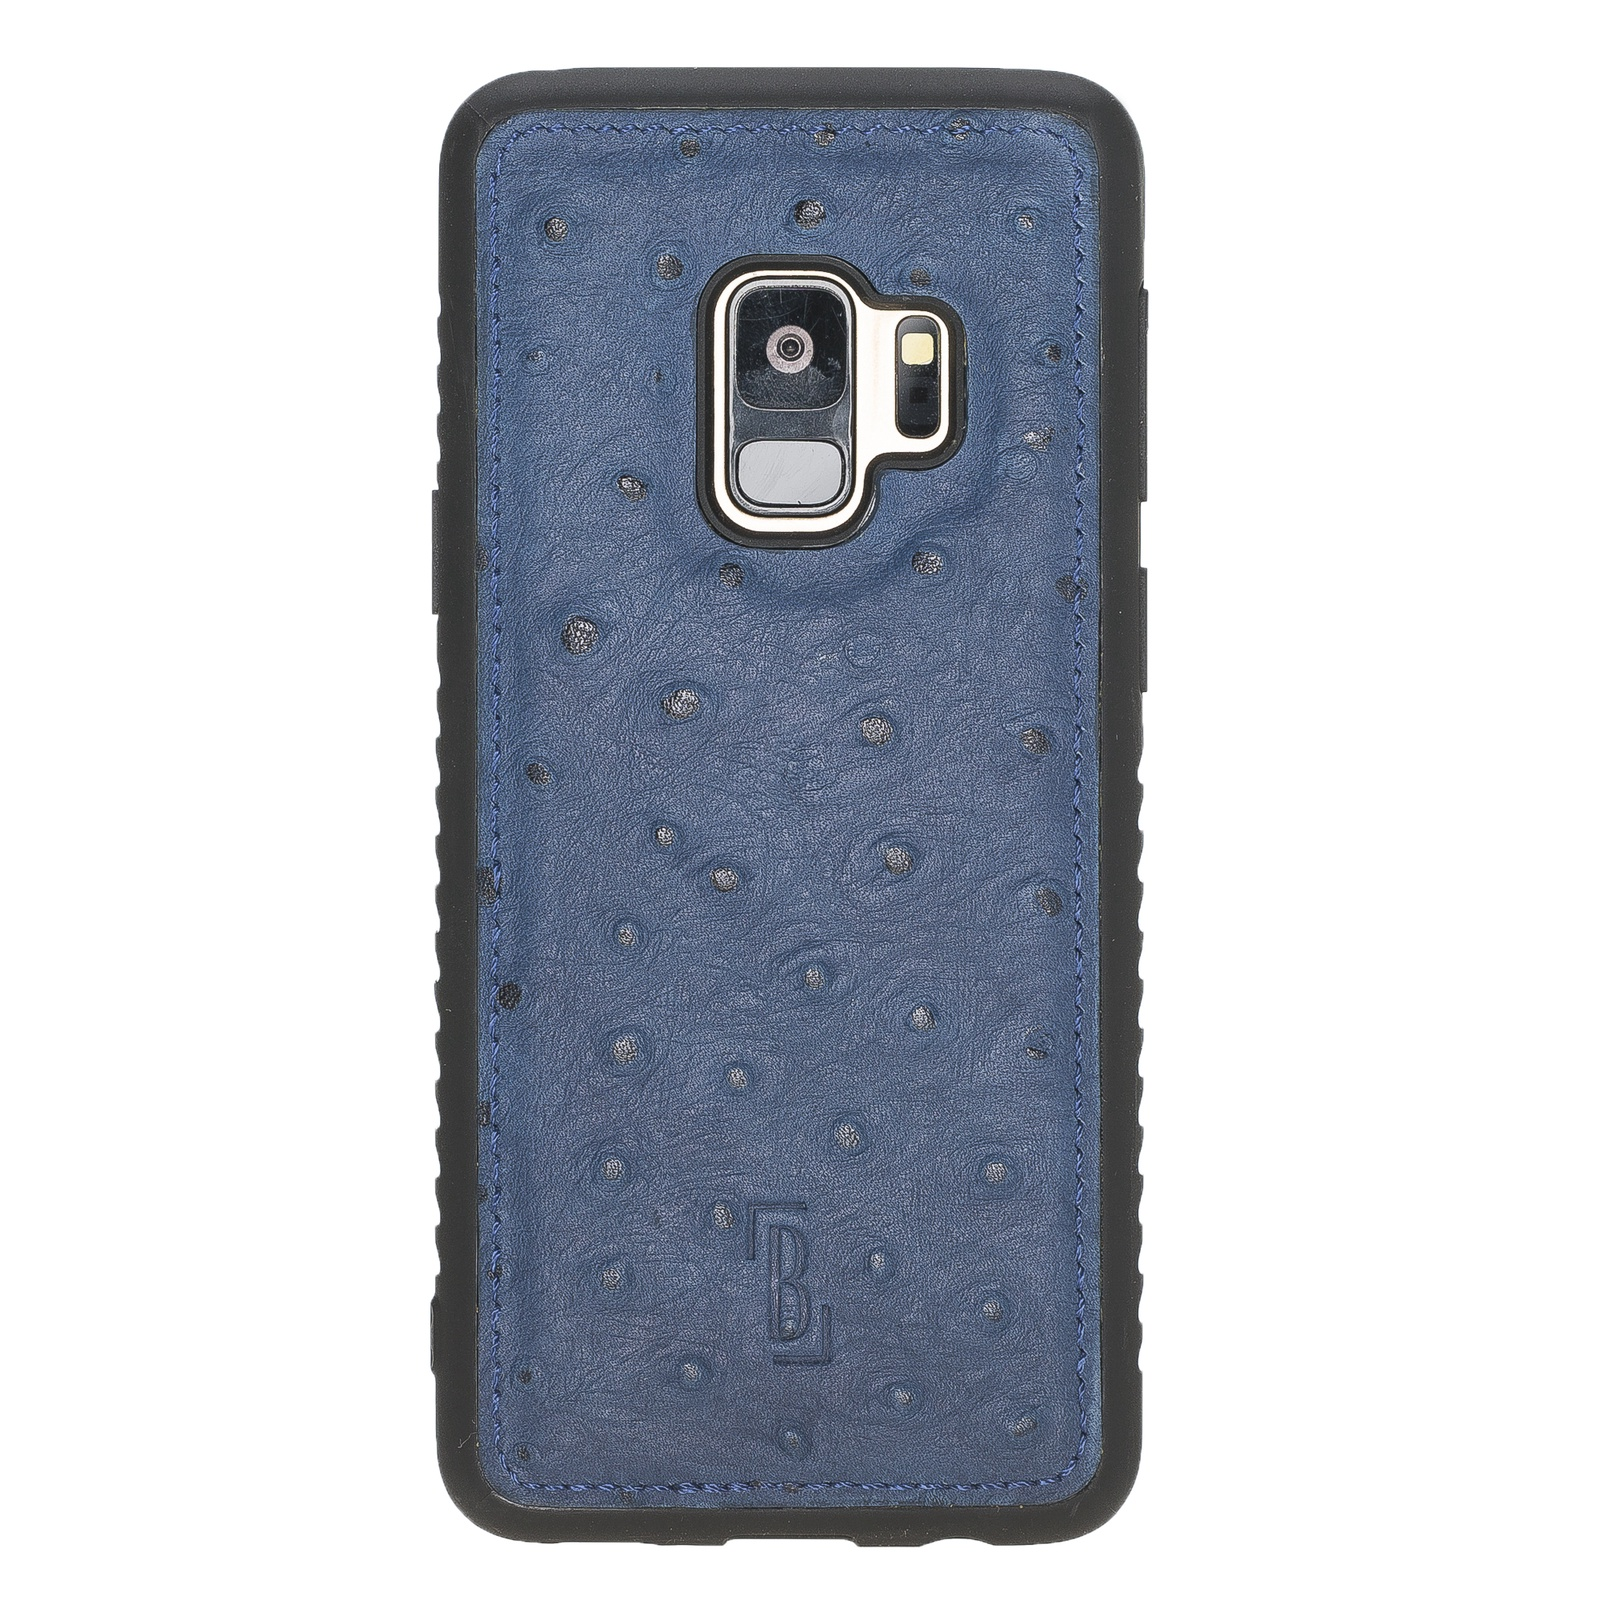 Чехол для сотового телефона Burkley для Samsung Galaxy S9 FlexCover, темно-синий